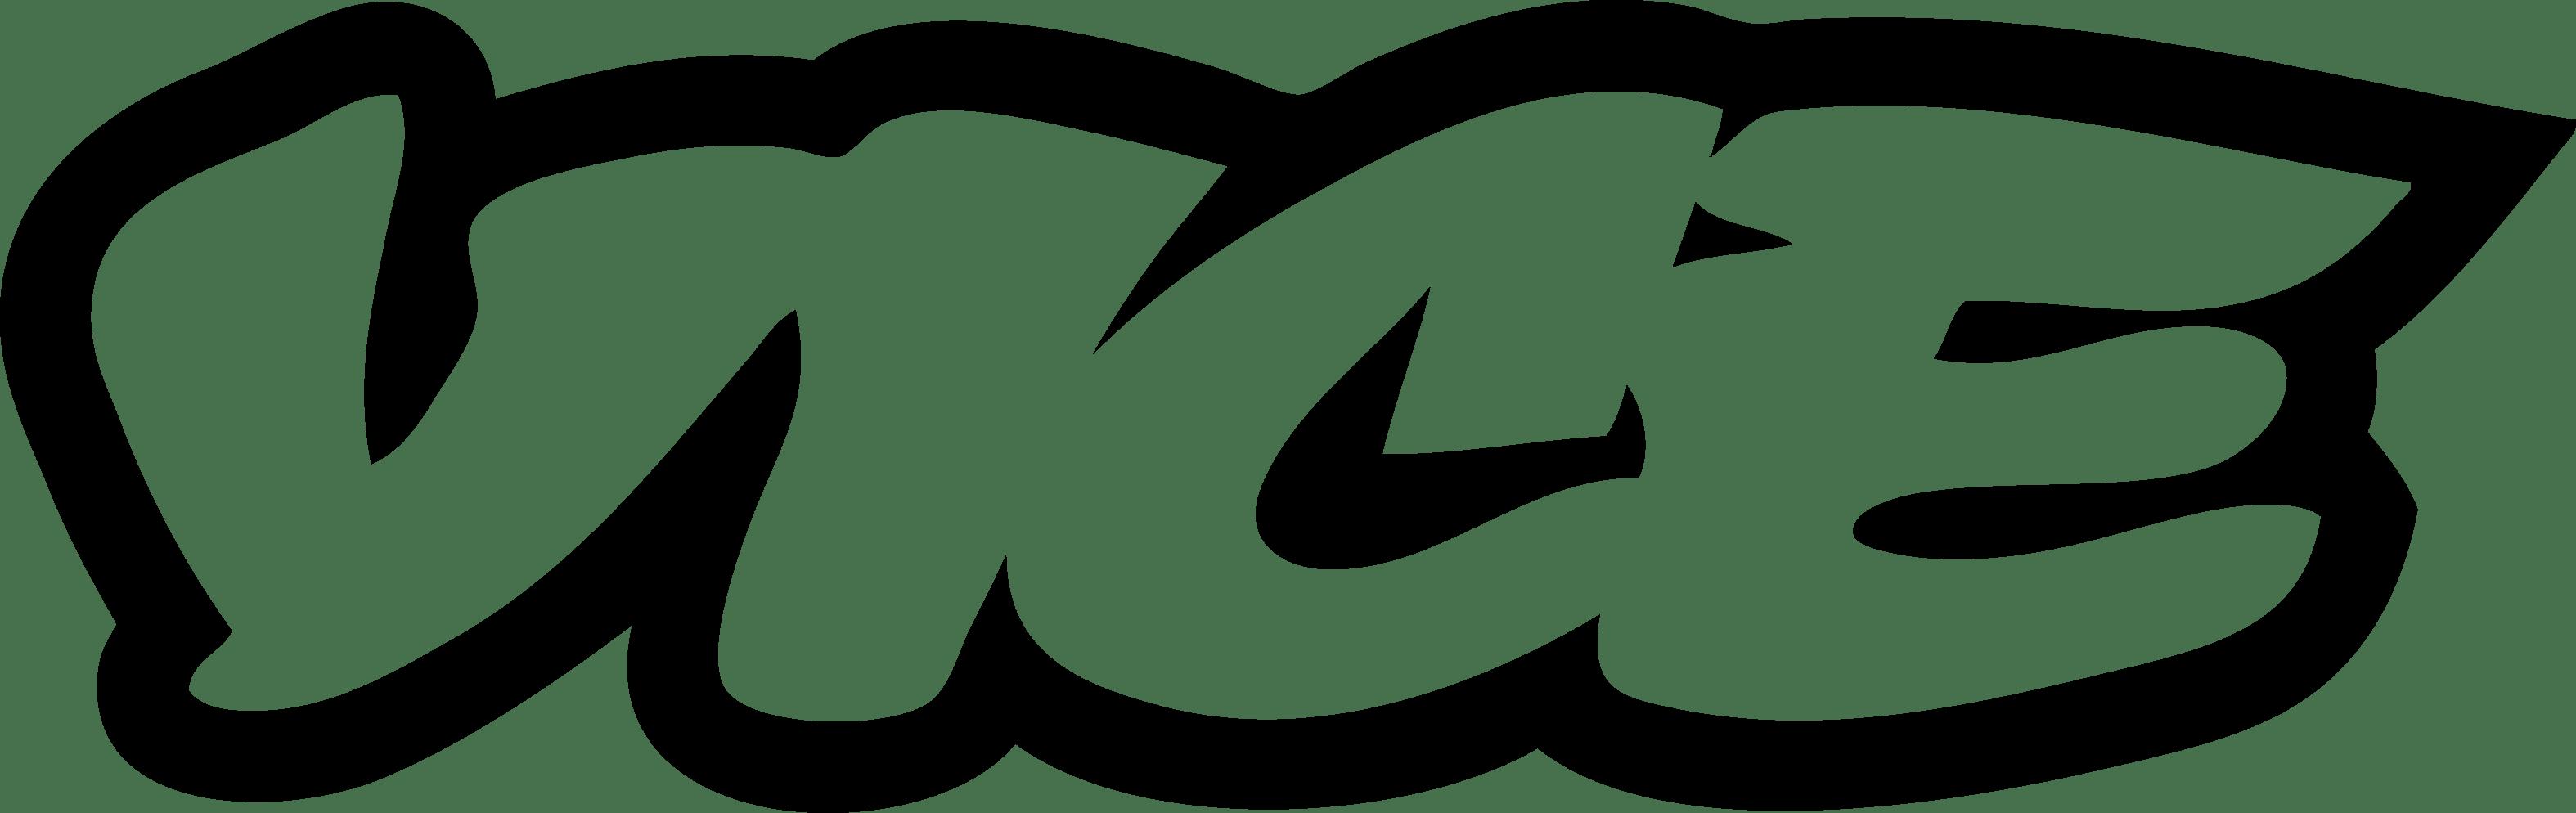 vice - VICE Leverages OpenX Programmatic Guaranteed Deals to Unlock Premium Video Spend